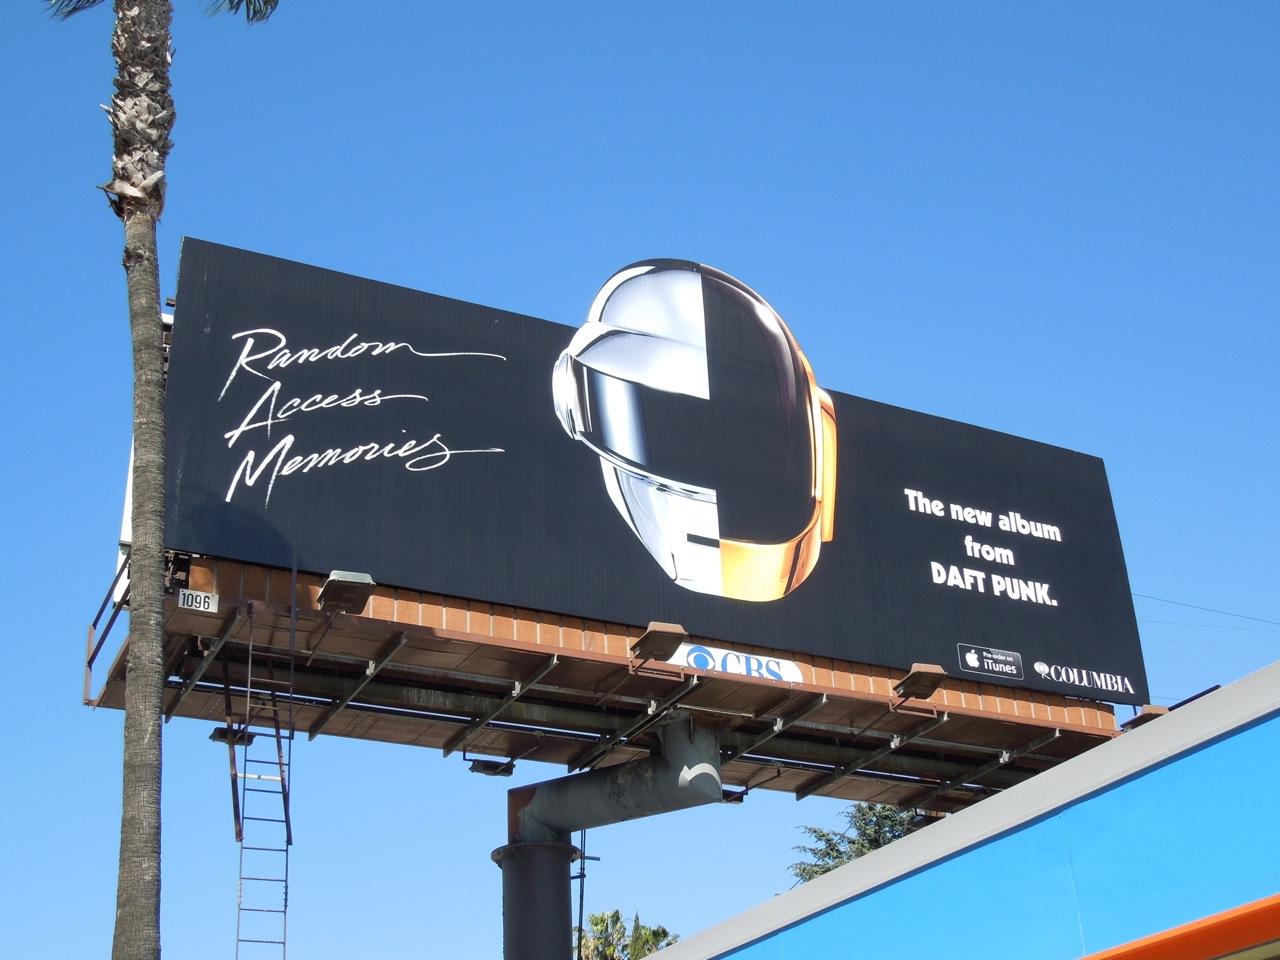 Daily Billboard Daft Punk Random Access Memories Album